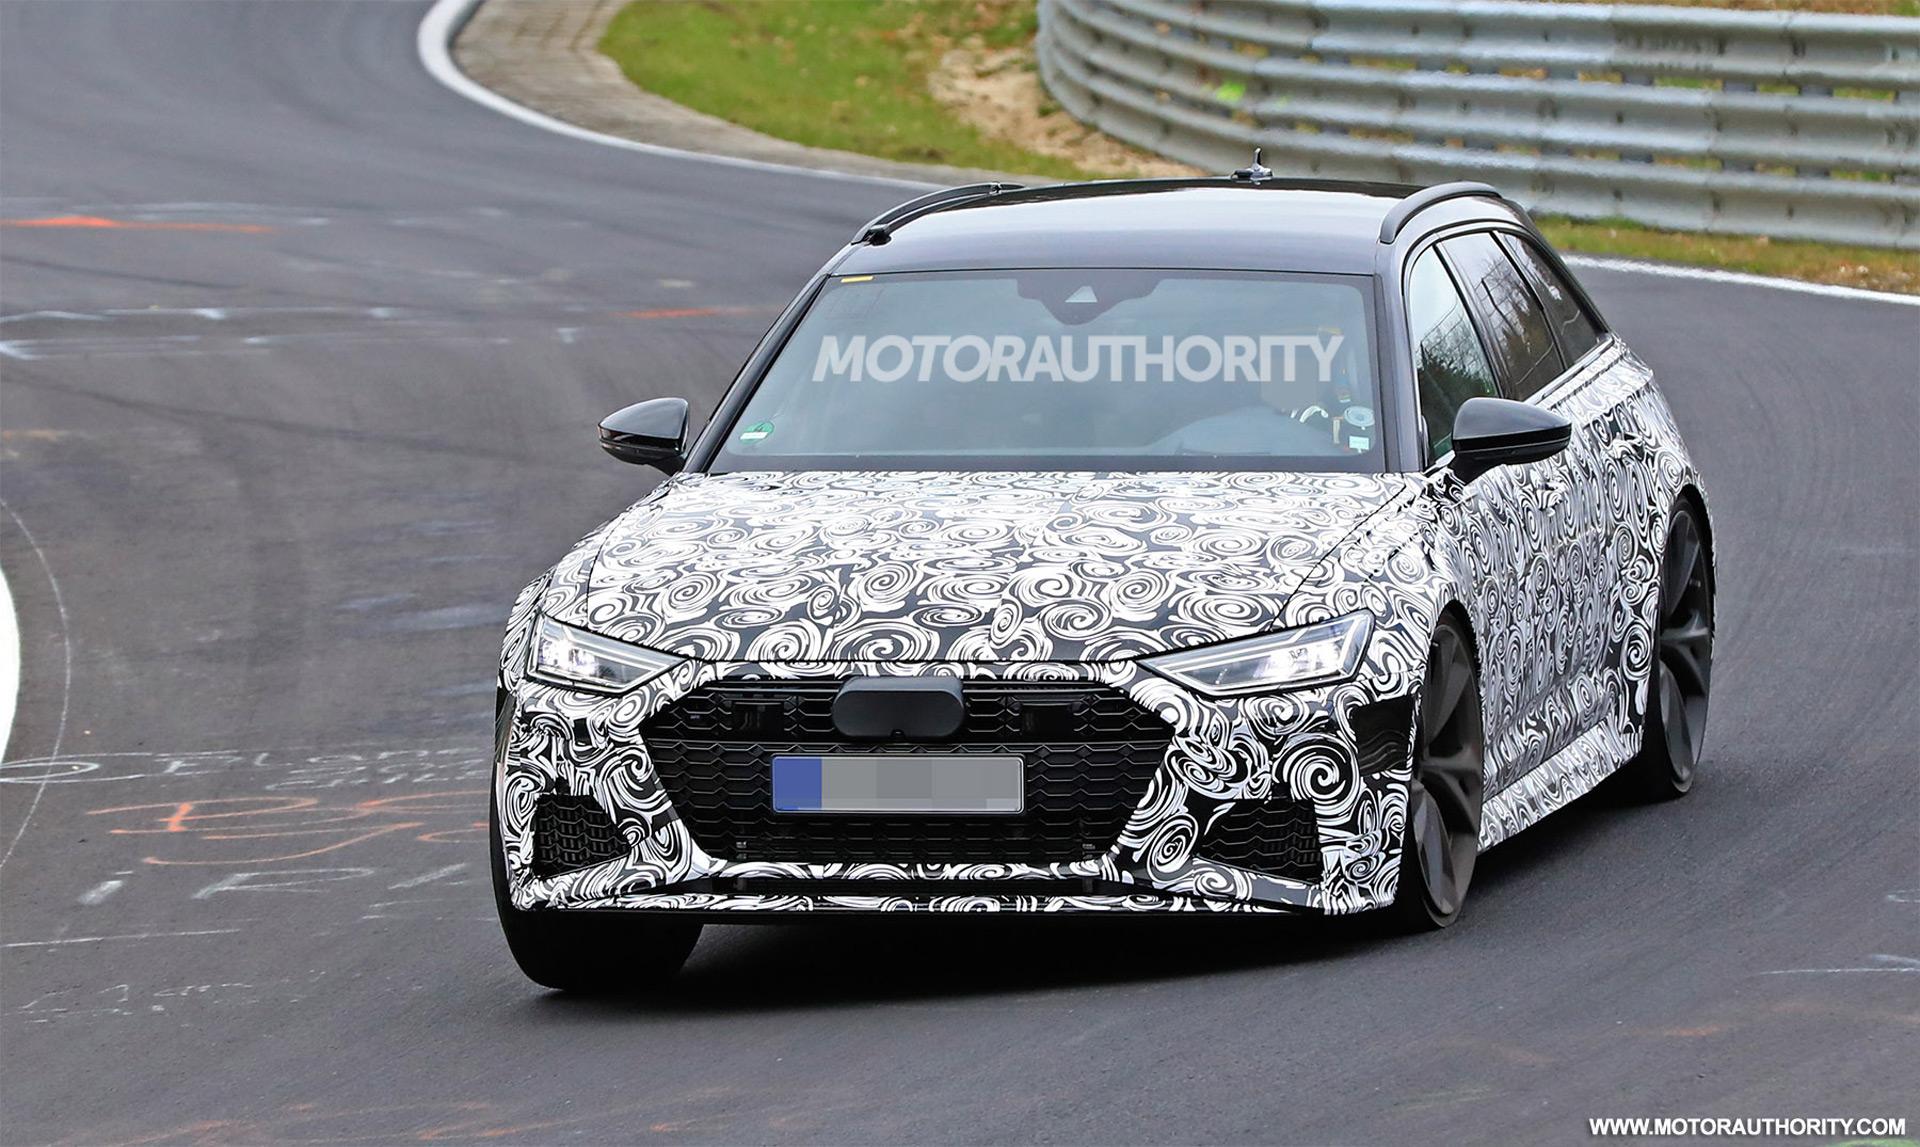 Kelebihan Audi A6 Rs Murah Berkualitas